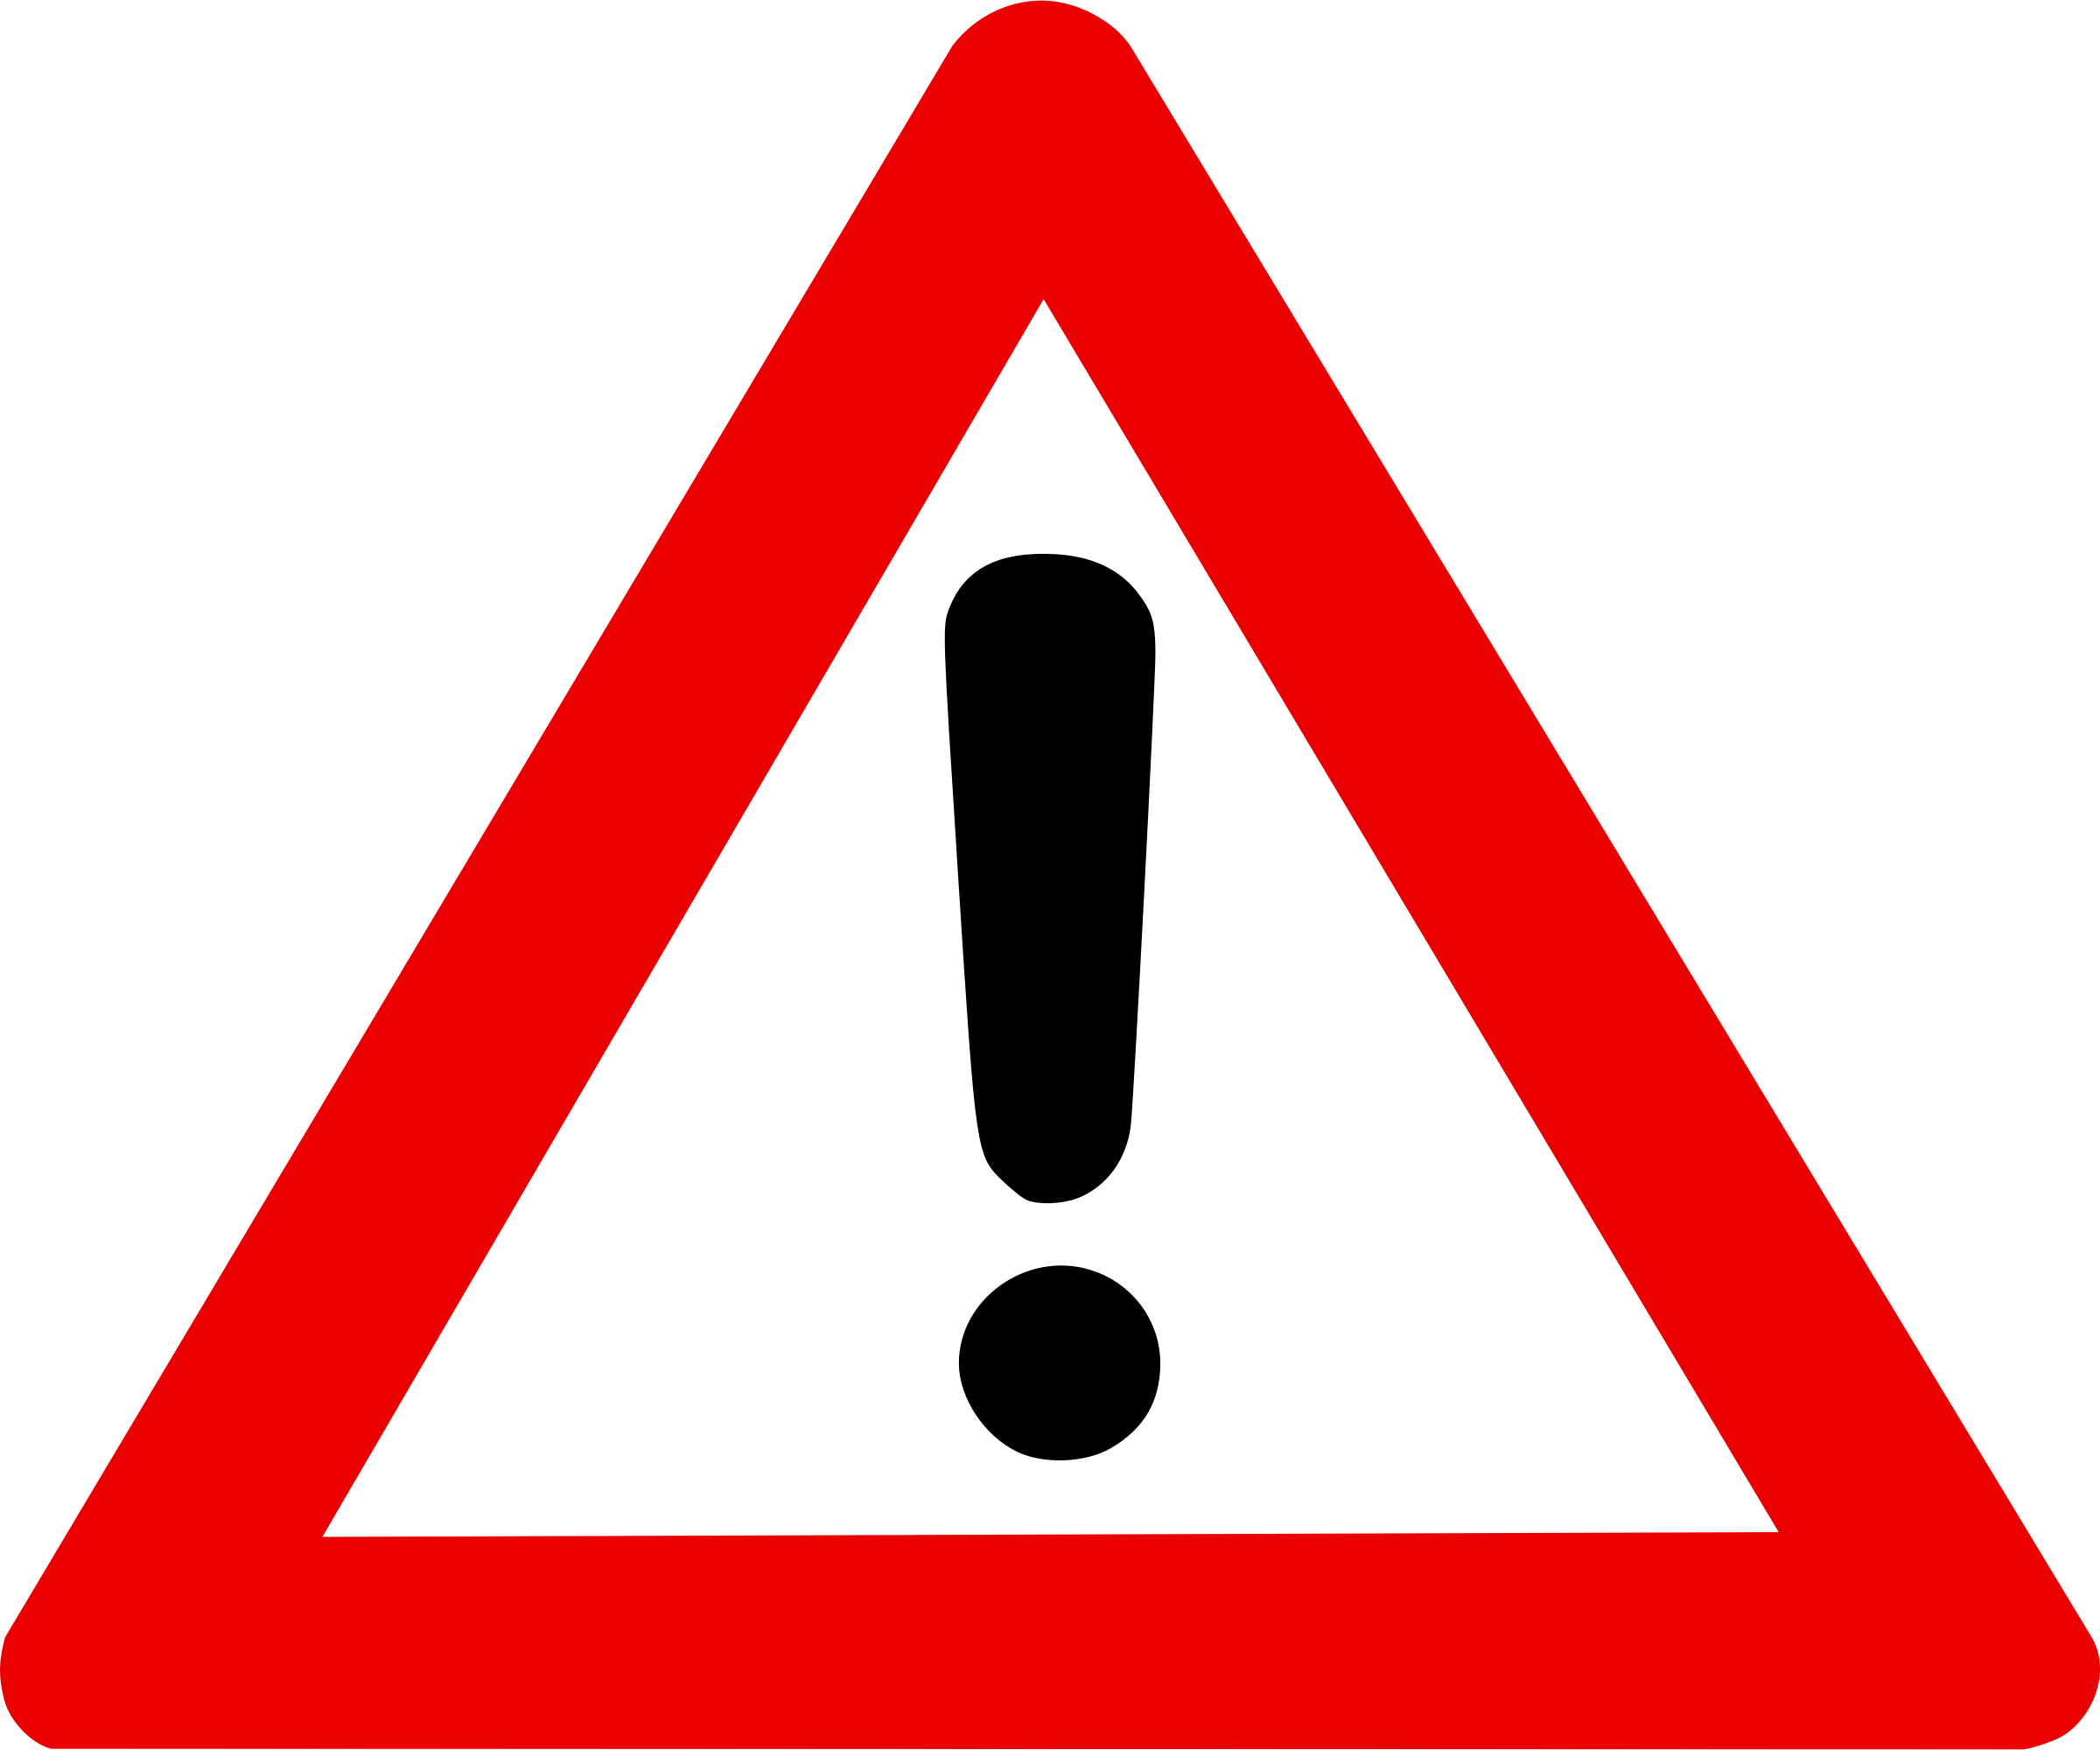 Stamp clipart warning. Logos sign